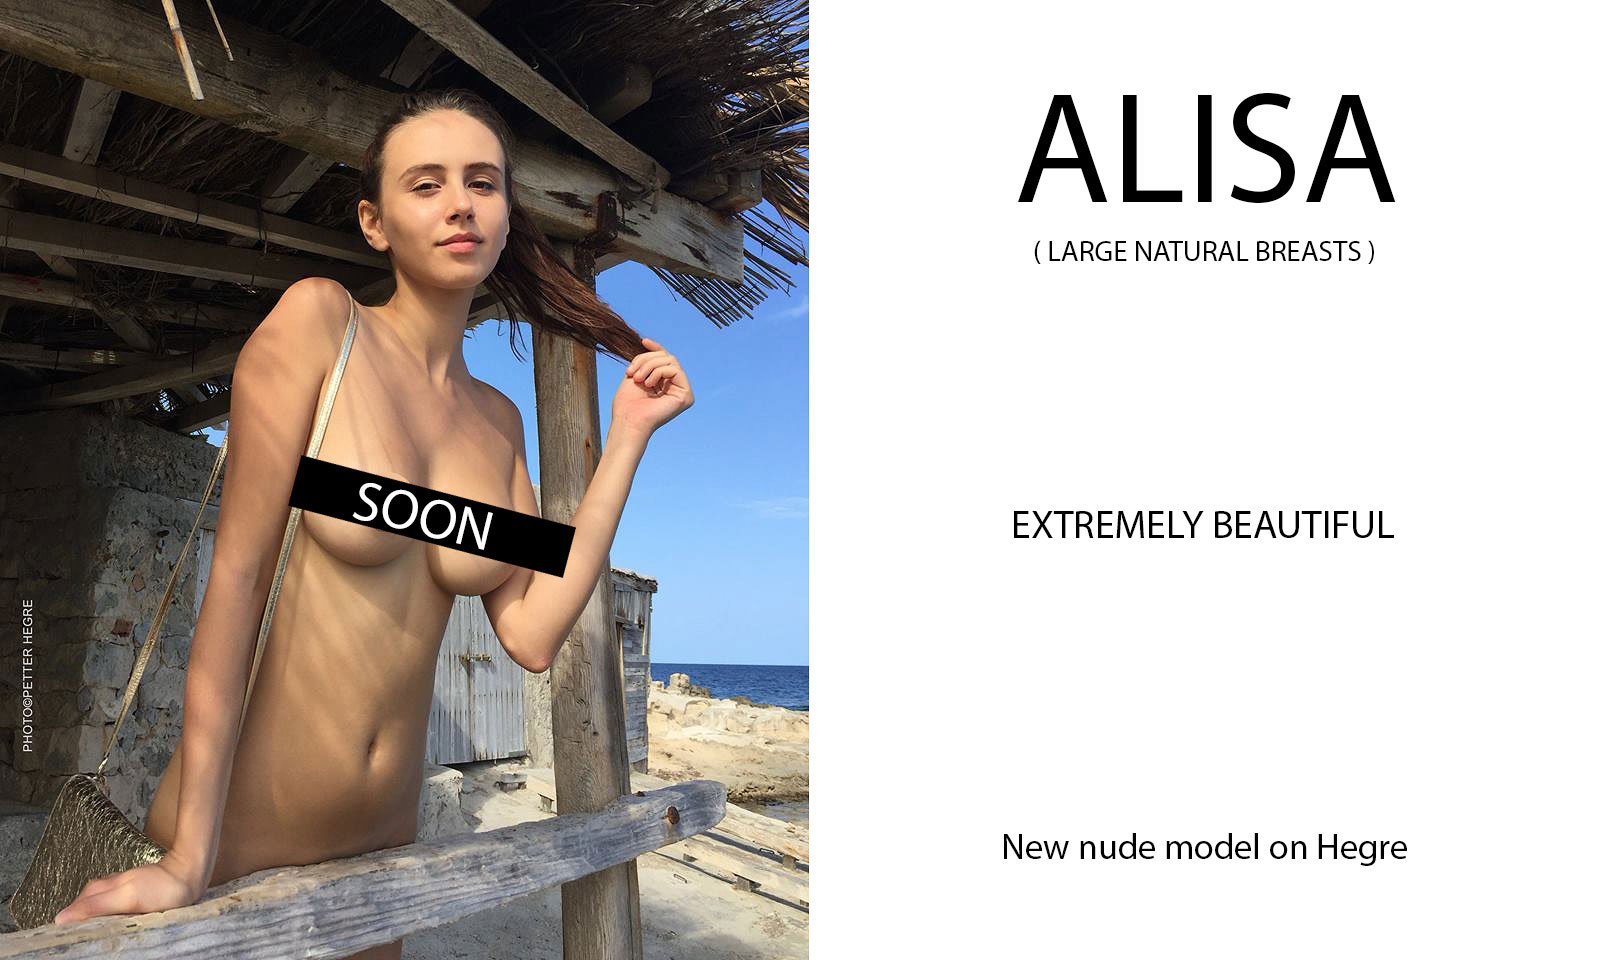 Alisa Hegre